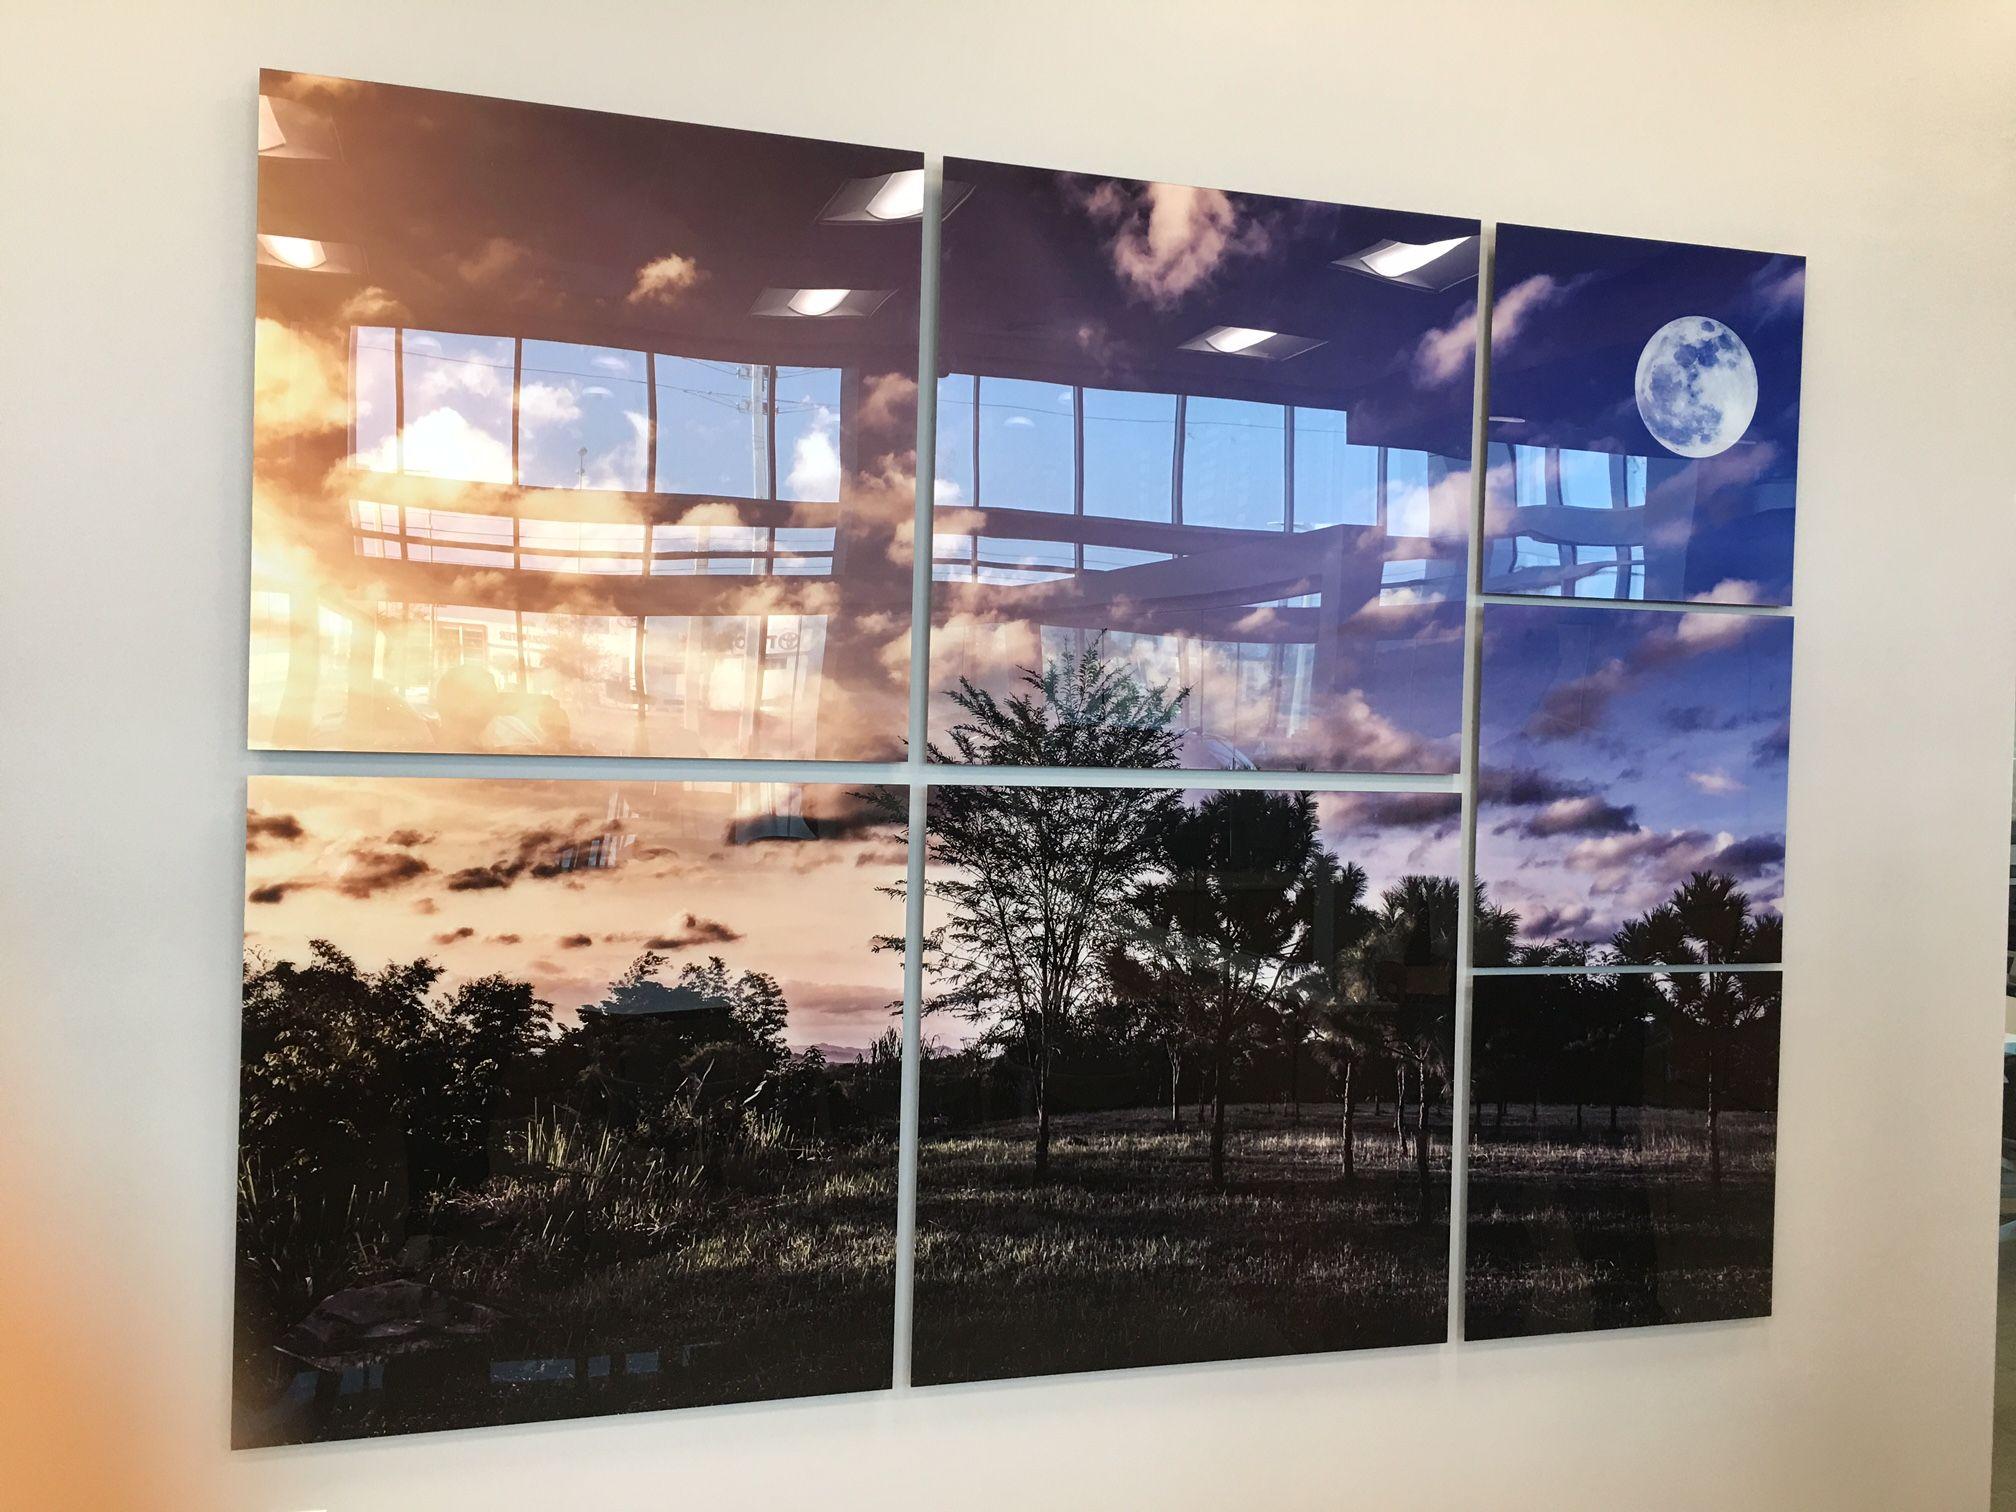 Customer Samples Of Acrylic Prints Vs Metallic Prints Acrylic Photo Prints Glass Photo Prints Acrylic Wall Art